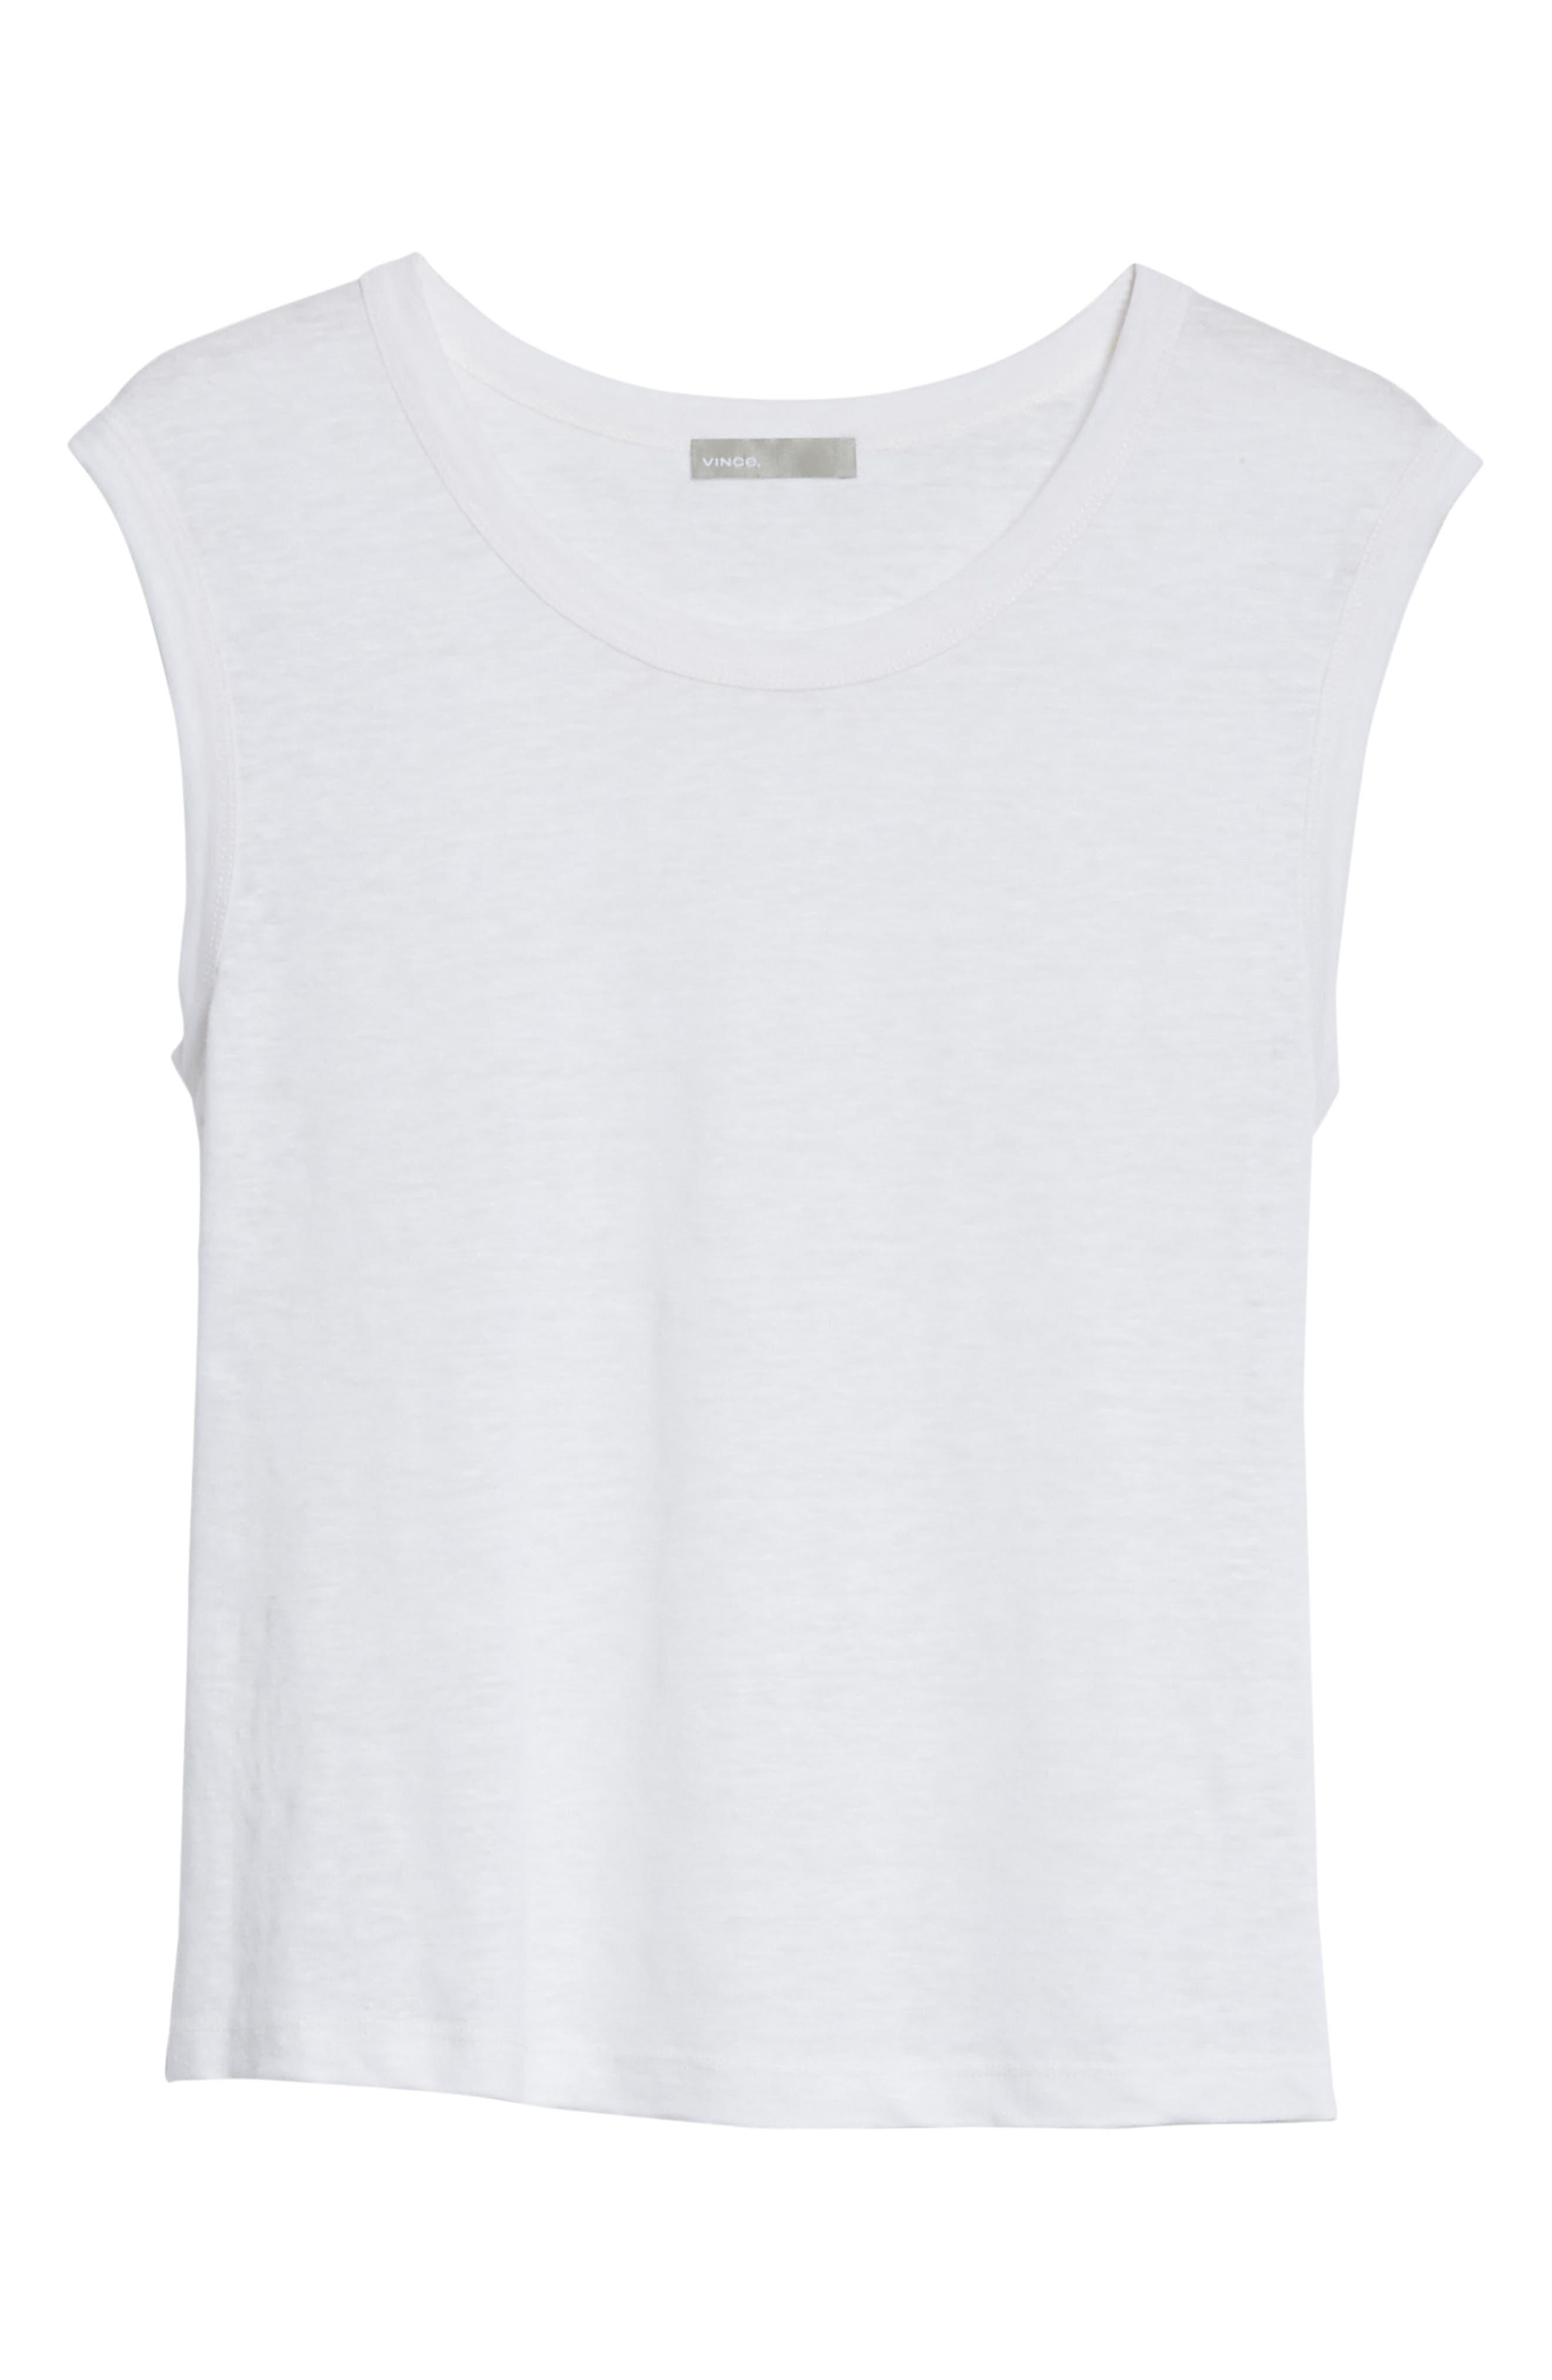 Linen Muscle Tank Top,                             Alternate thumbnail 6, color,                             Optic White